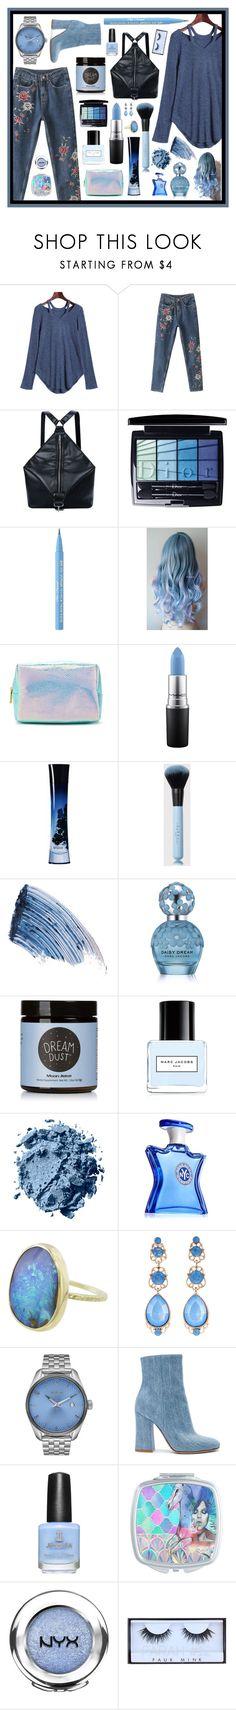 """Powder blue"" by beanpod ❤ liked on Polyvore featuring Christian Dior, Too Faced Cosmetics, Forever 21, MAC Cosmetics, Giorgio Armani, Sisley, Marc Jacobs, Moon Juice, Bond No. 9 and Natasha"